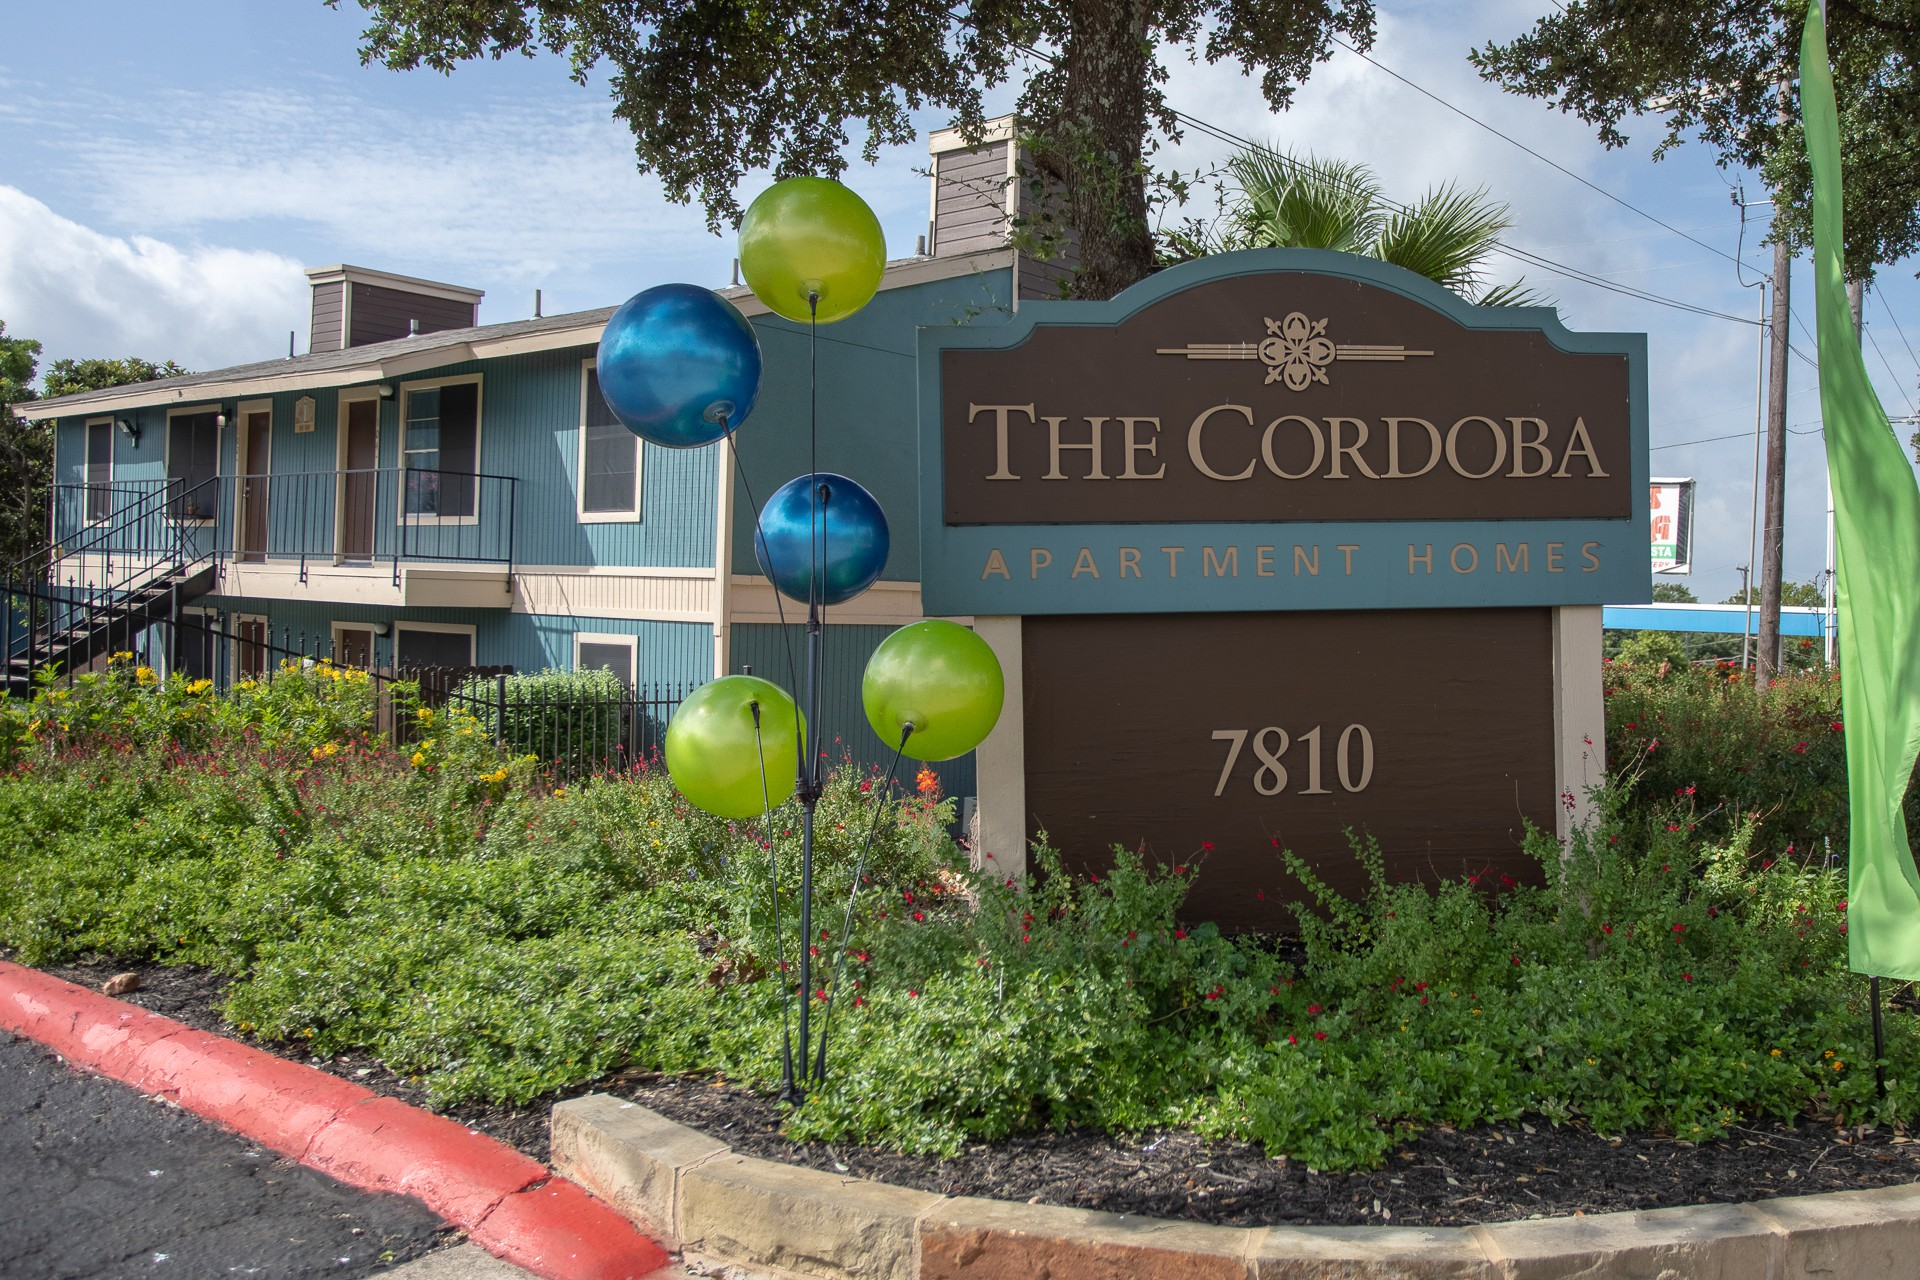 Apartments Near UTHSCSA The Cordoba for The University of Texas Health Science Center at San Antonio Students in San Antonio, TX